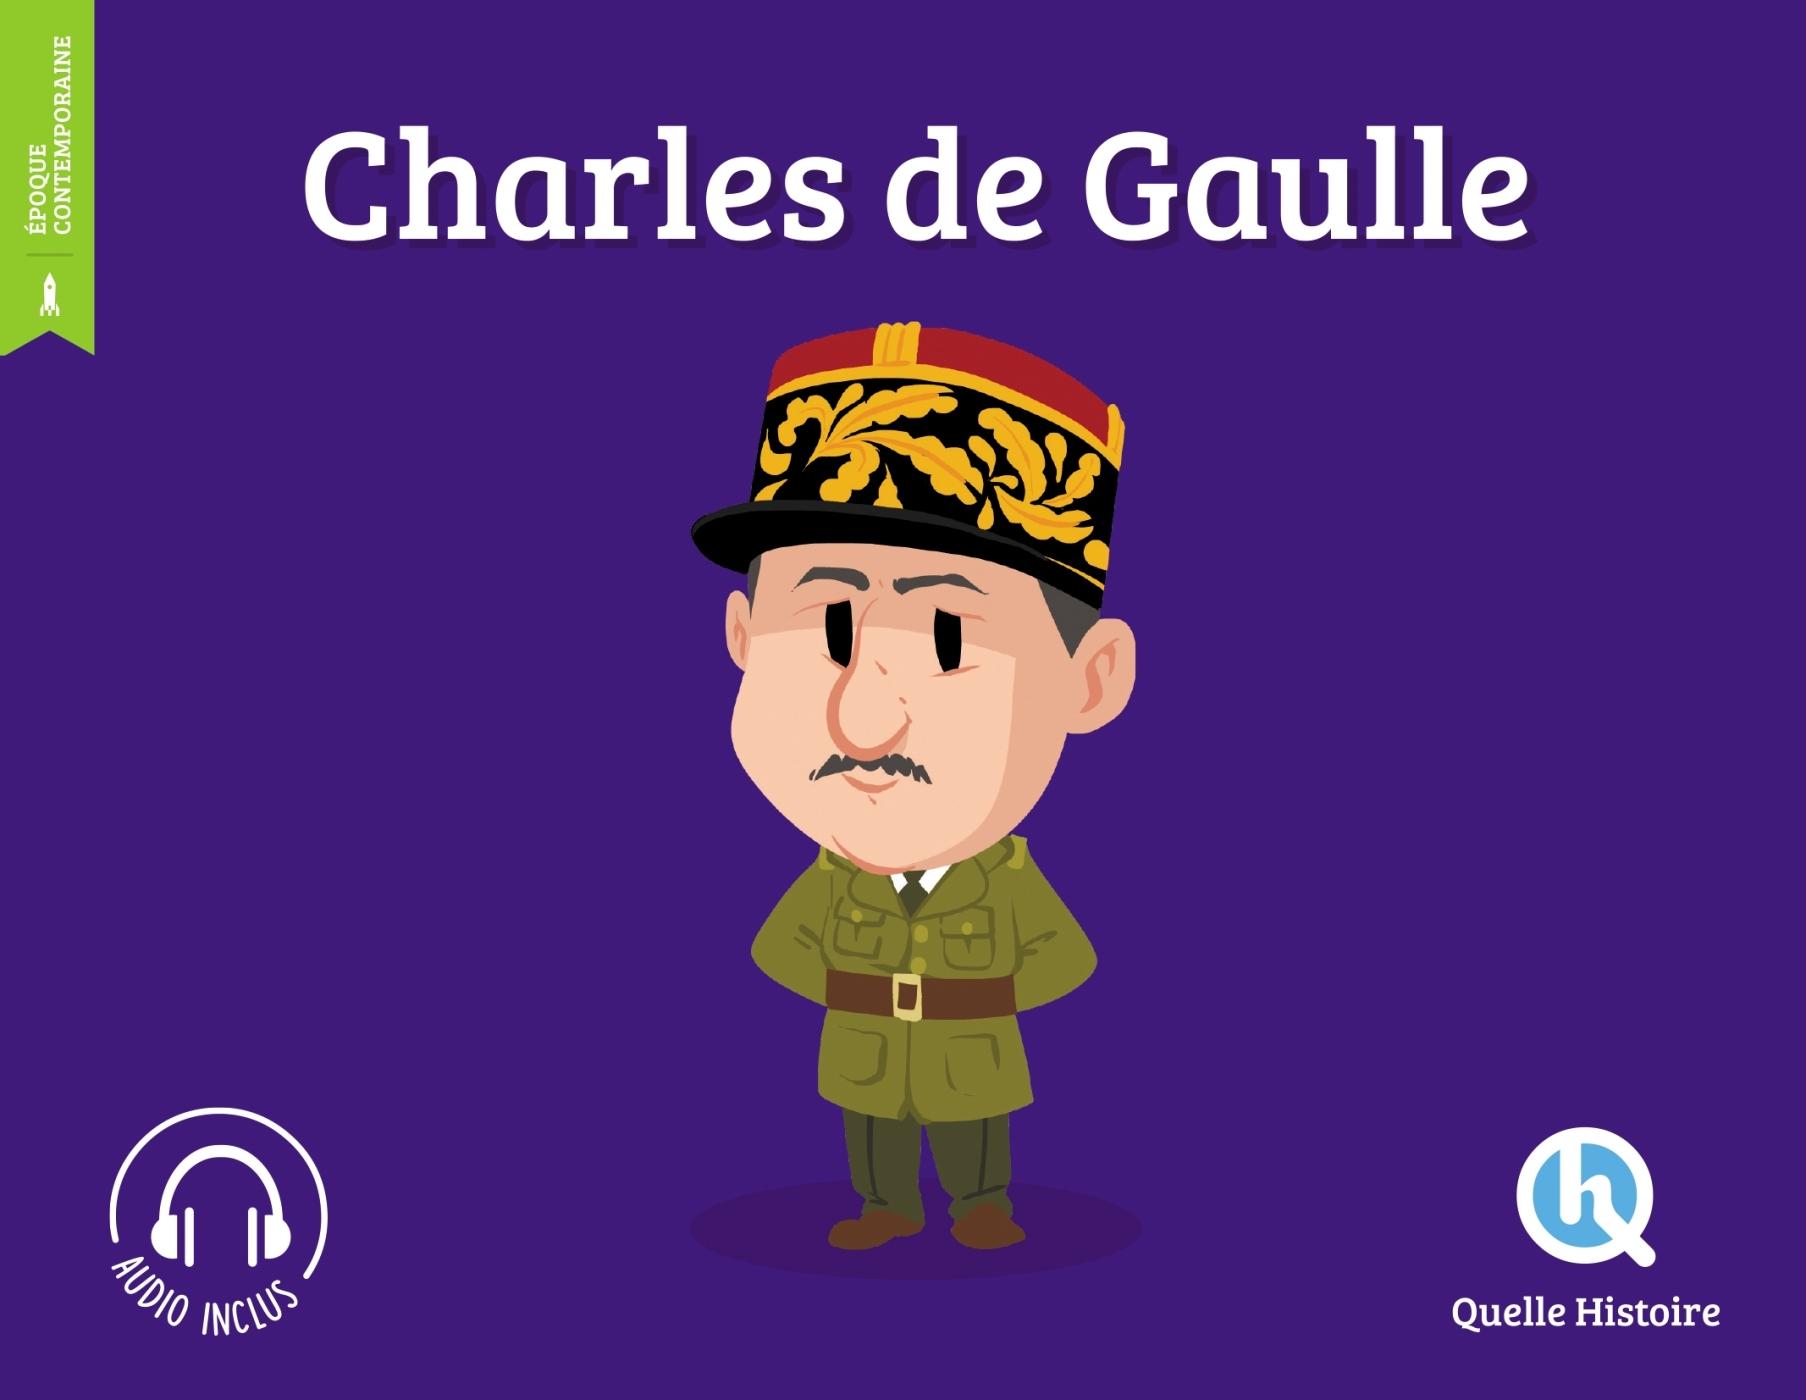 CHARLES DE GAULLE (2020)